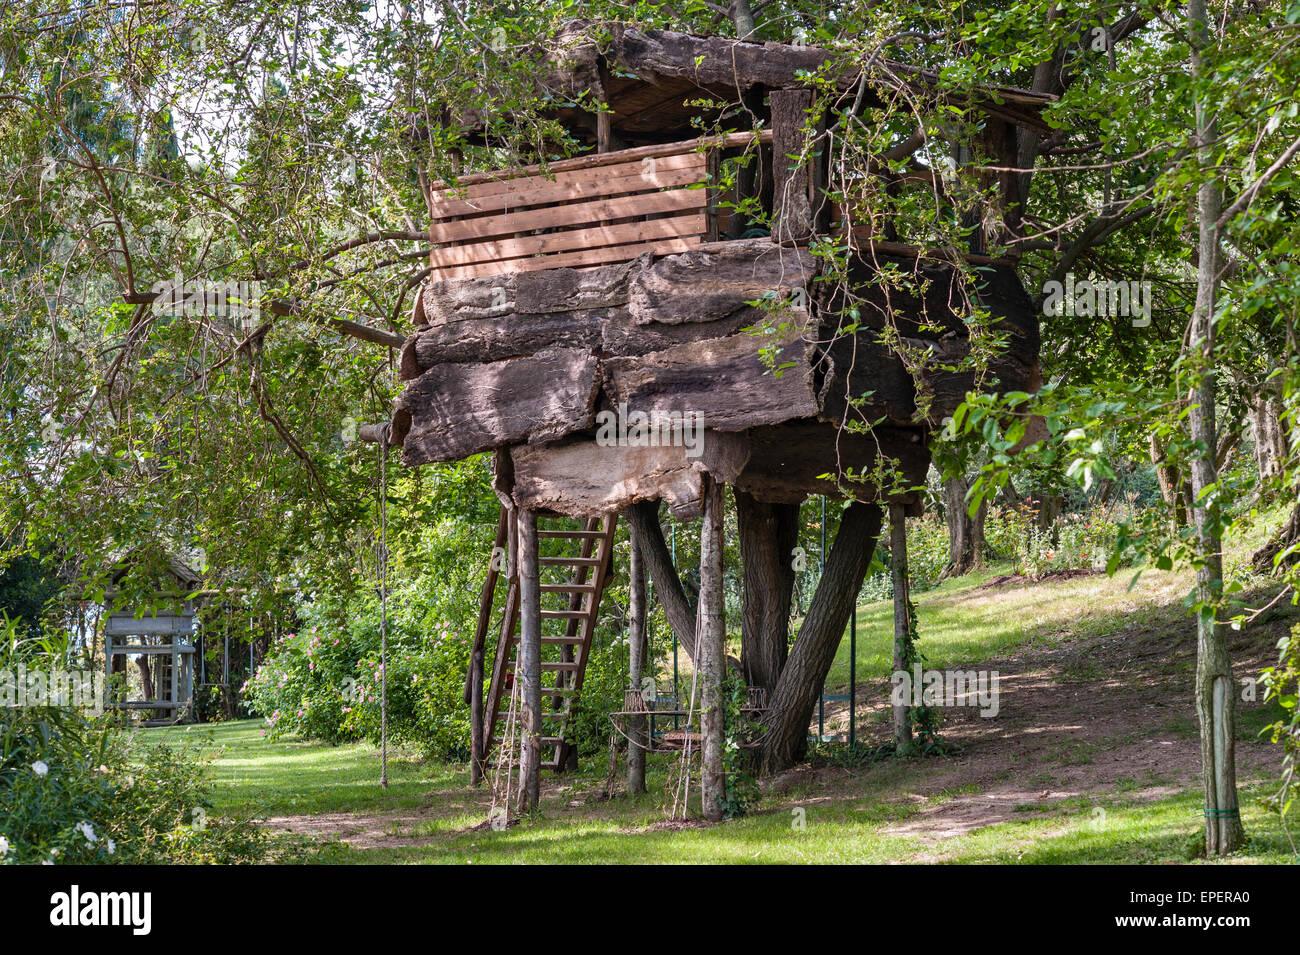 Italy A Garden Tree House Built For Children Stock Photo